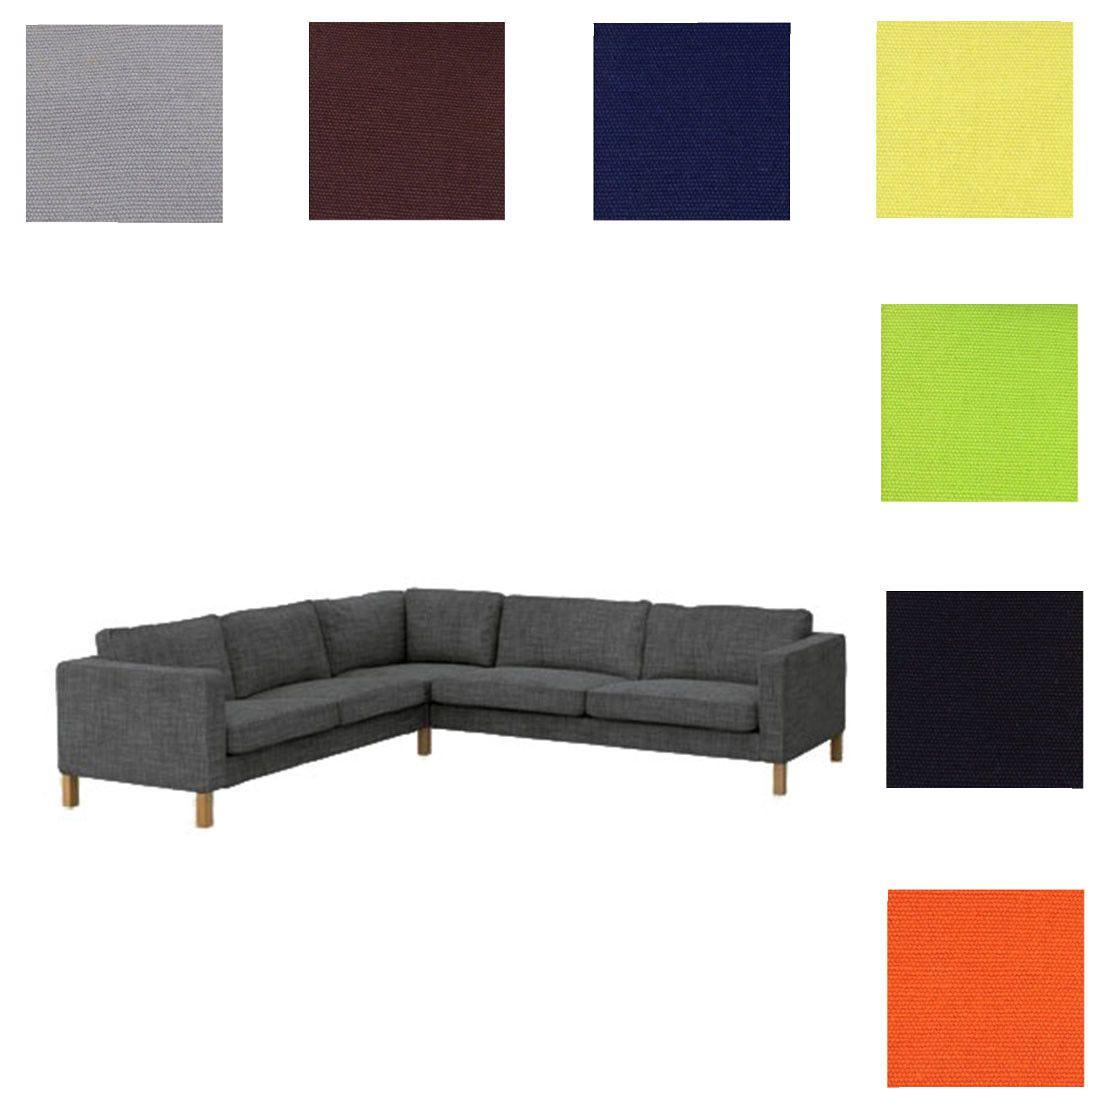 Karlstad 2 3 3 2 Corner Sofa Cover Sectional Sofa Cover In 2020 Corner Sofa Covers Sofa Covers Sofa Back Cushions